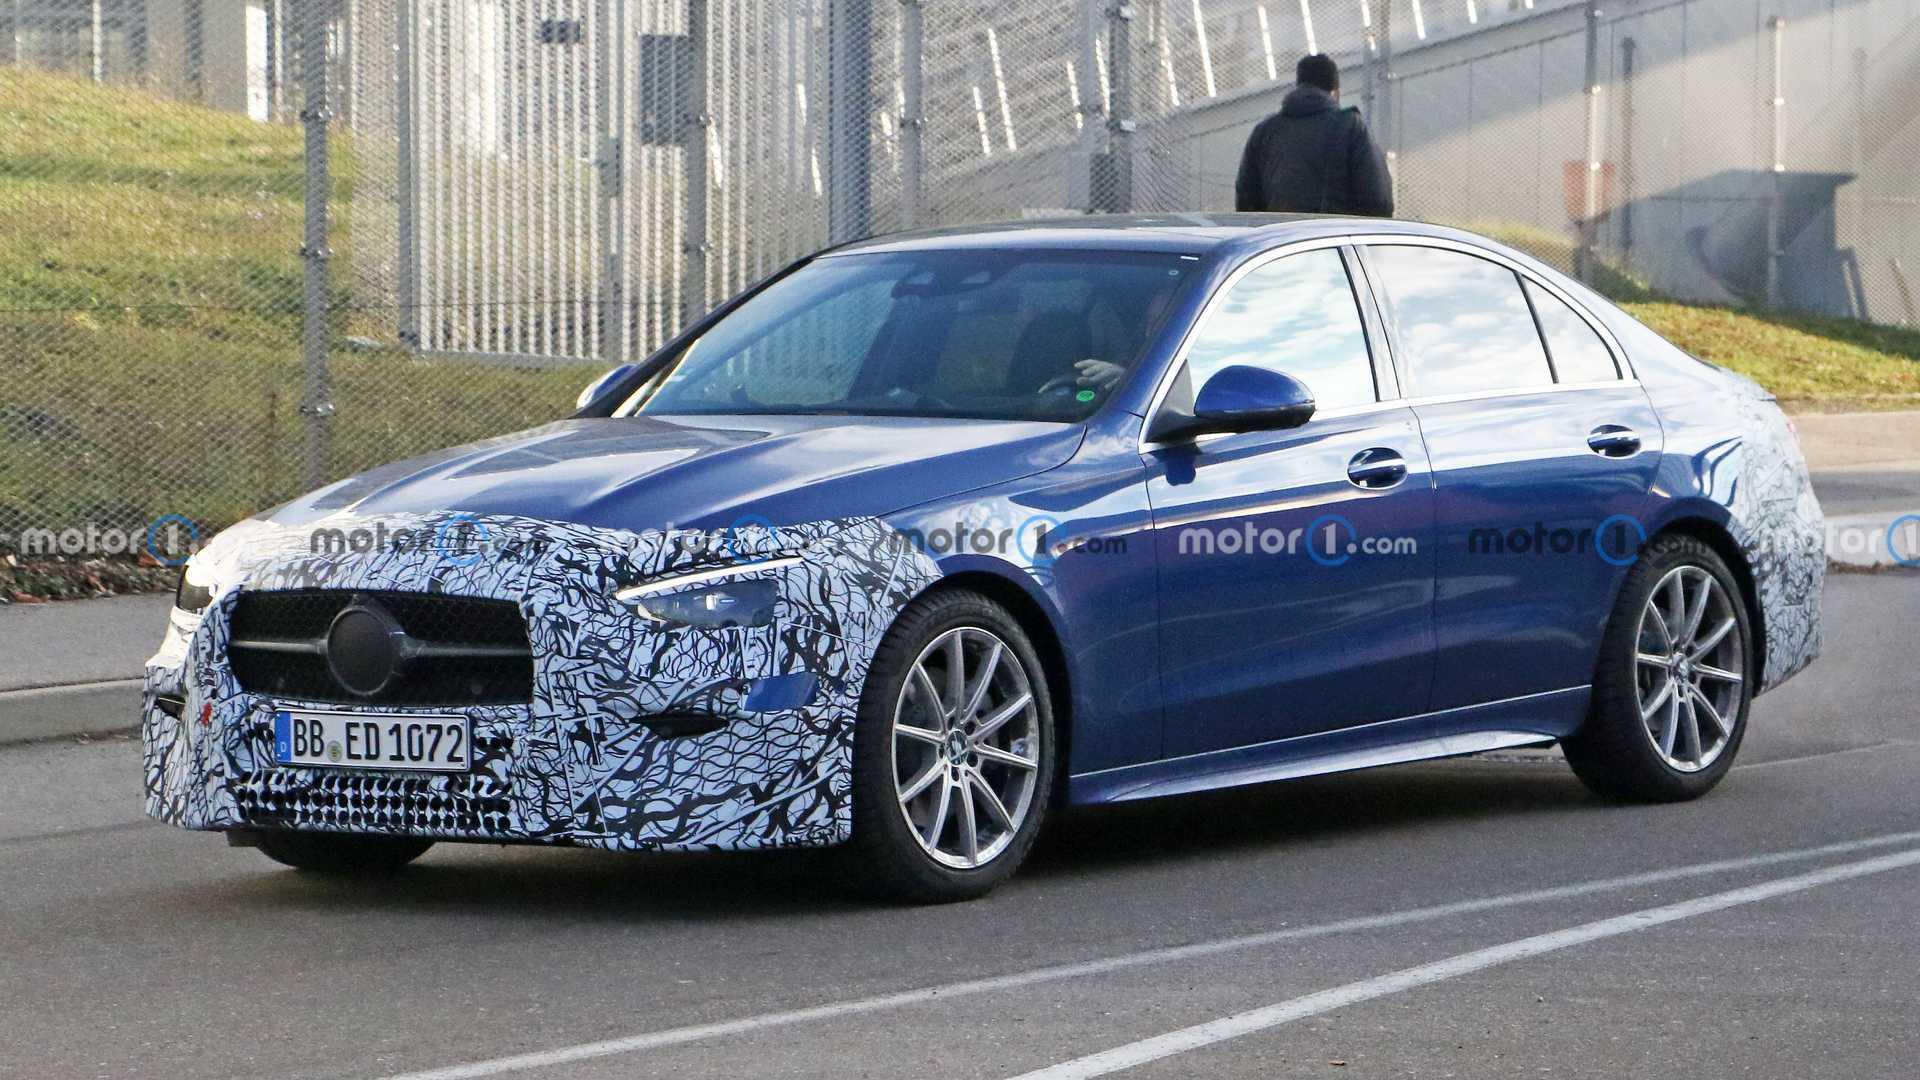 Mercedes-Benz C-Klasse (2021): Neue Details kurz vor Debüt enthüllt - Motor1 Deutschland